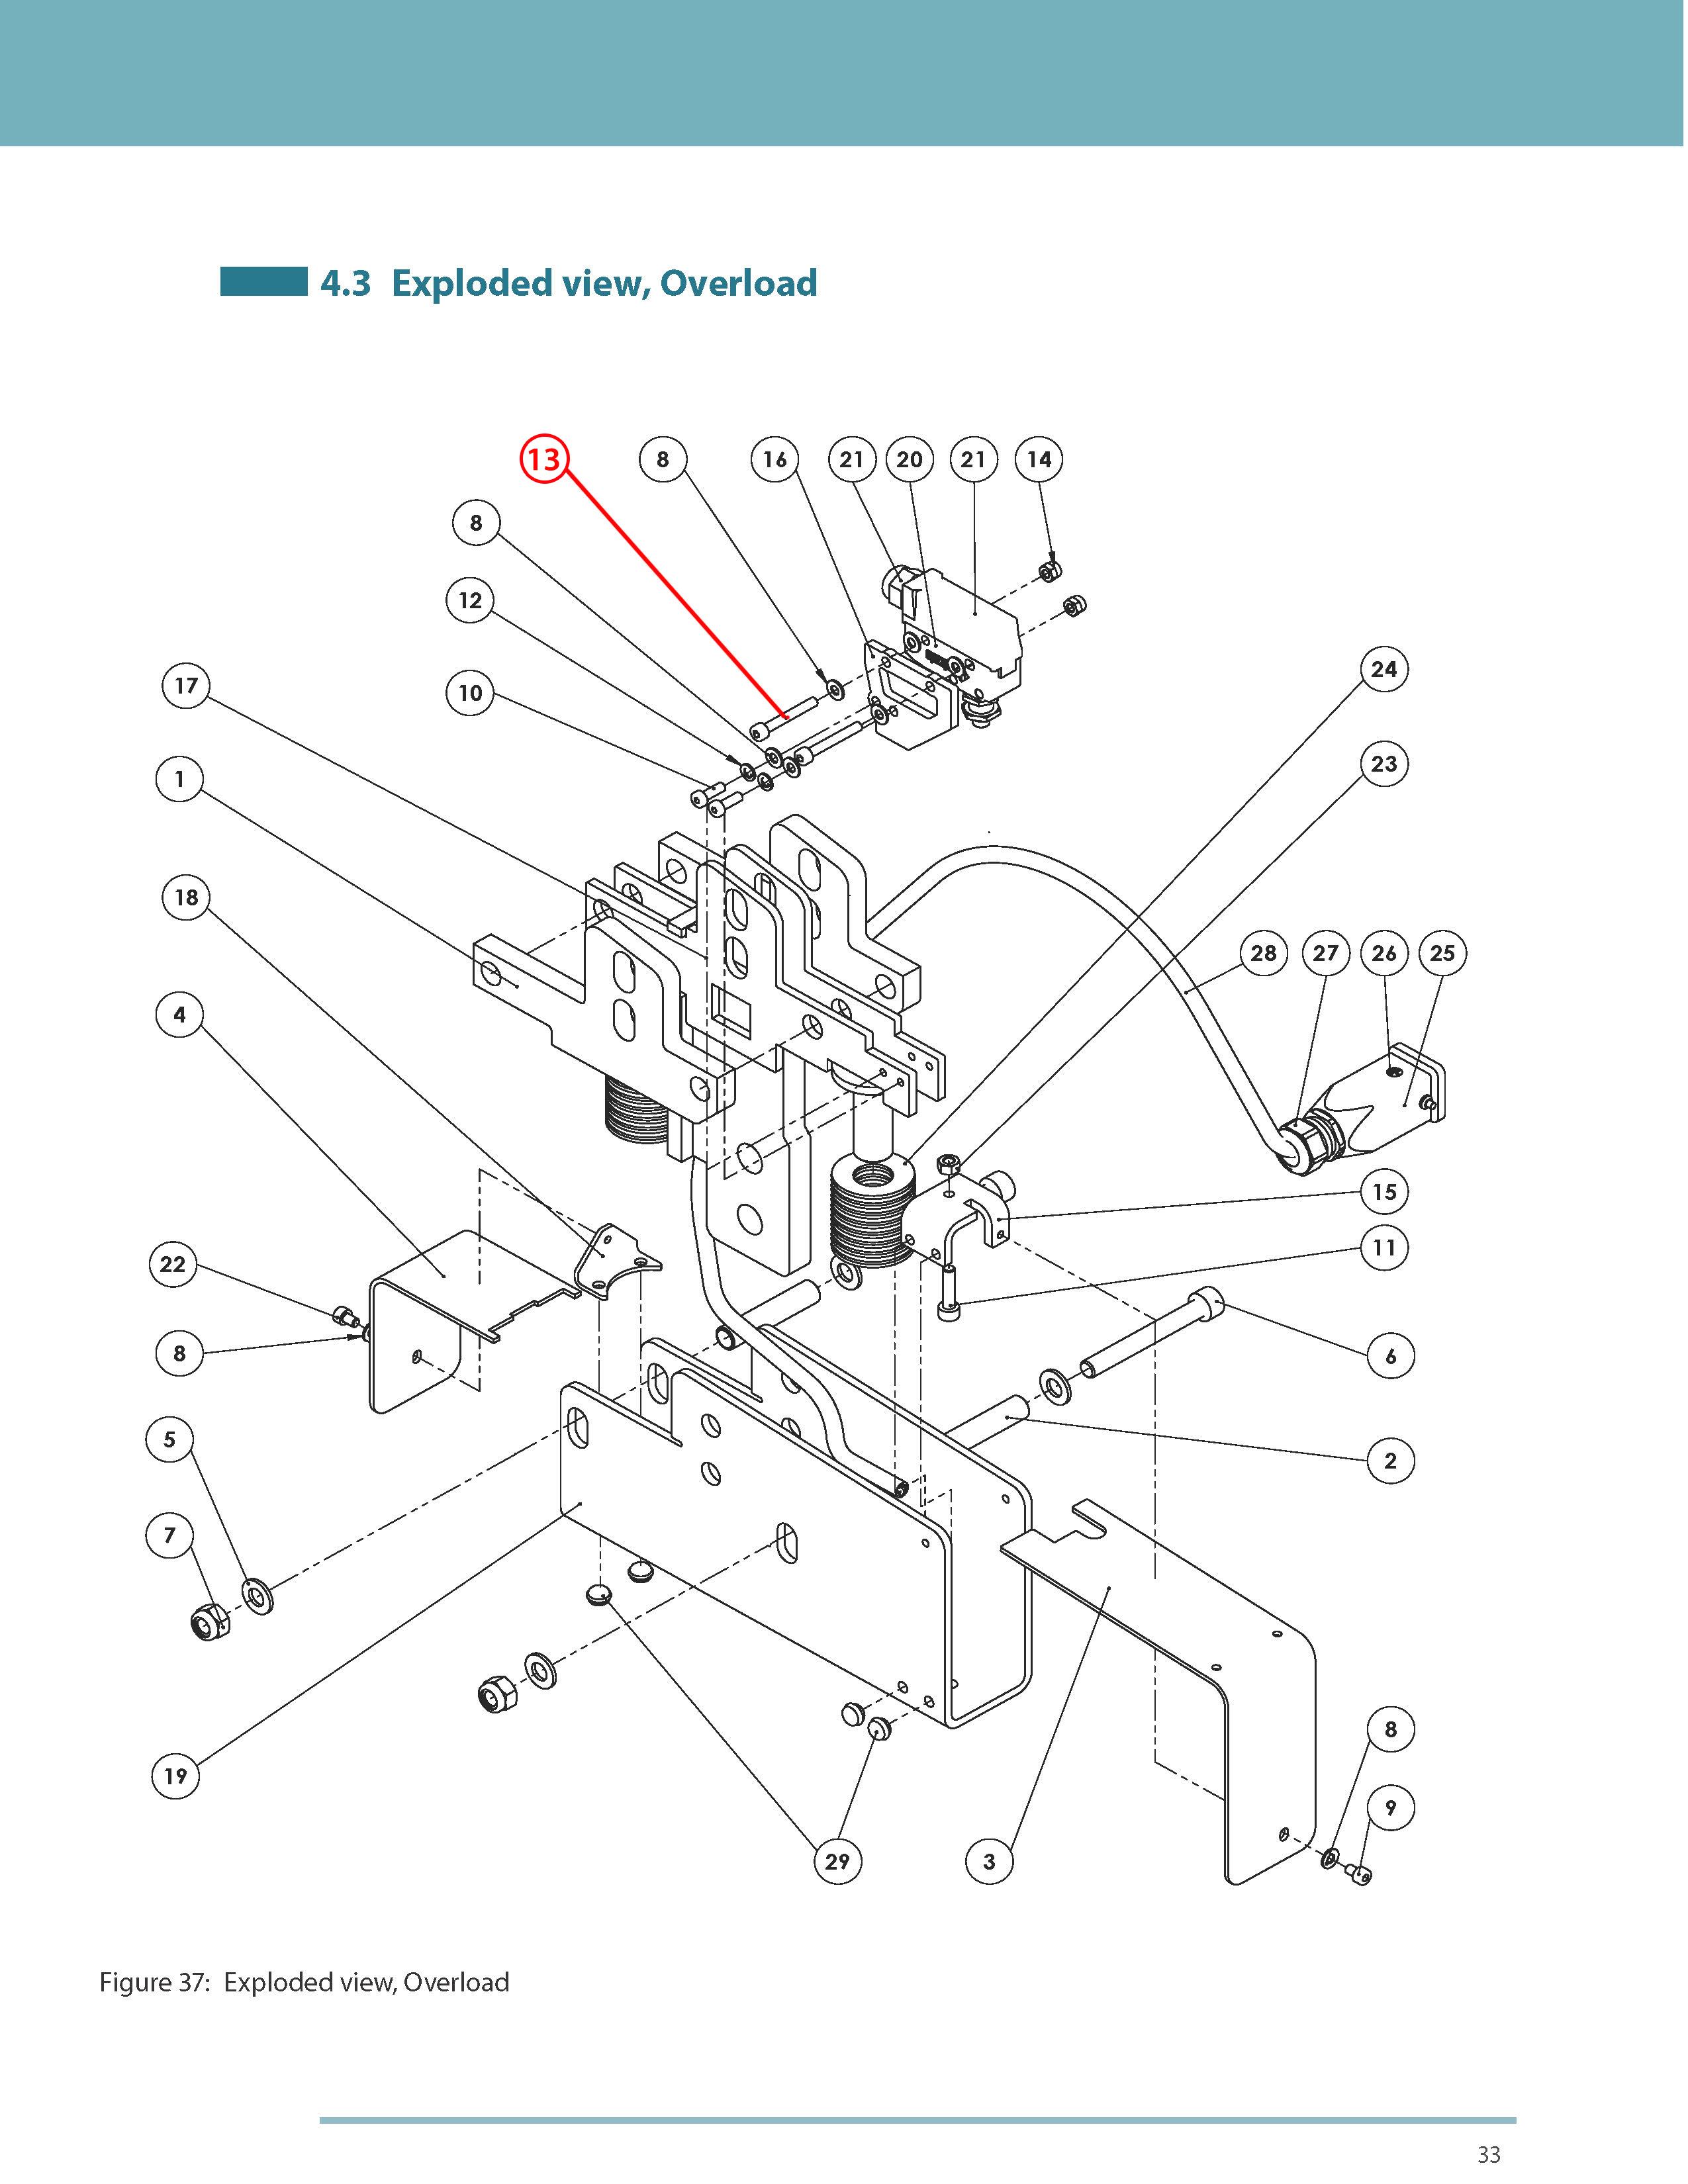 Socket Head Cap Screw M4 X 30 Din 912 Zinc Plated Access Schematic